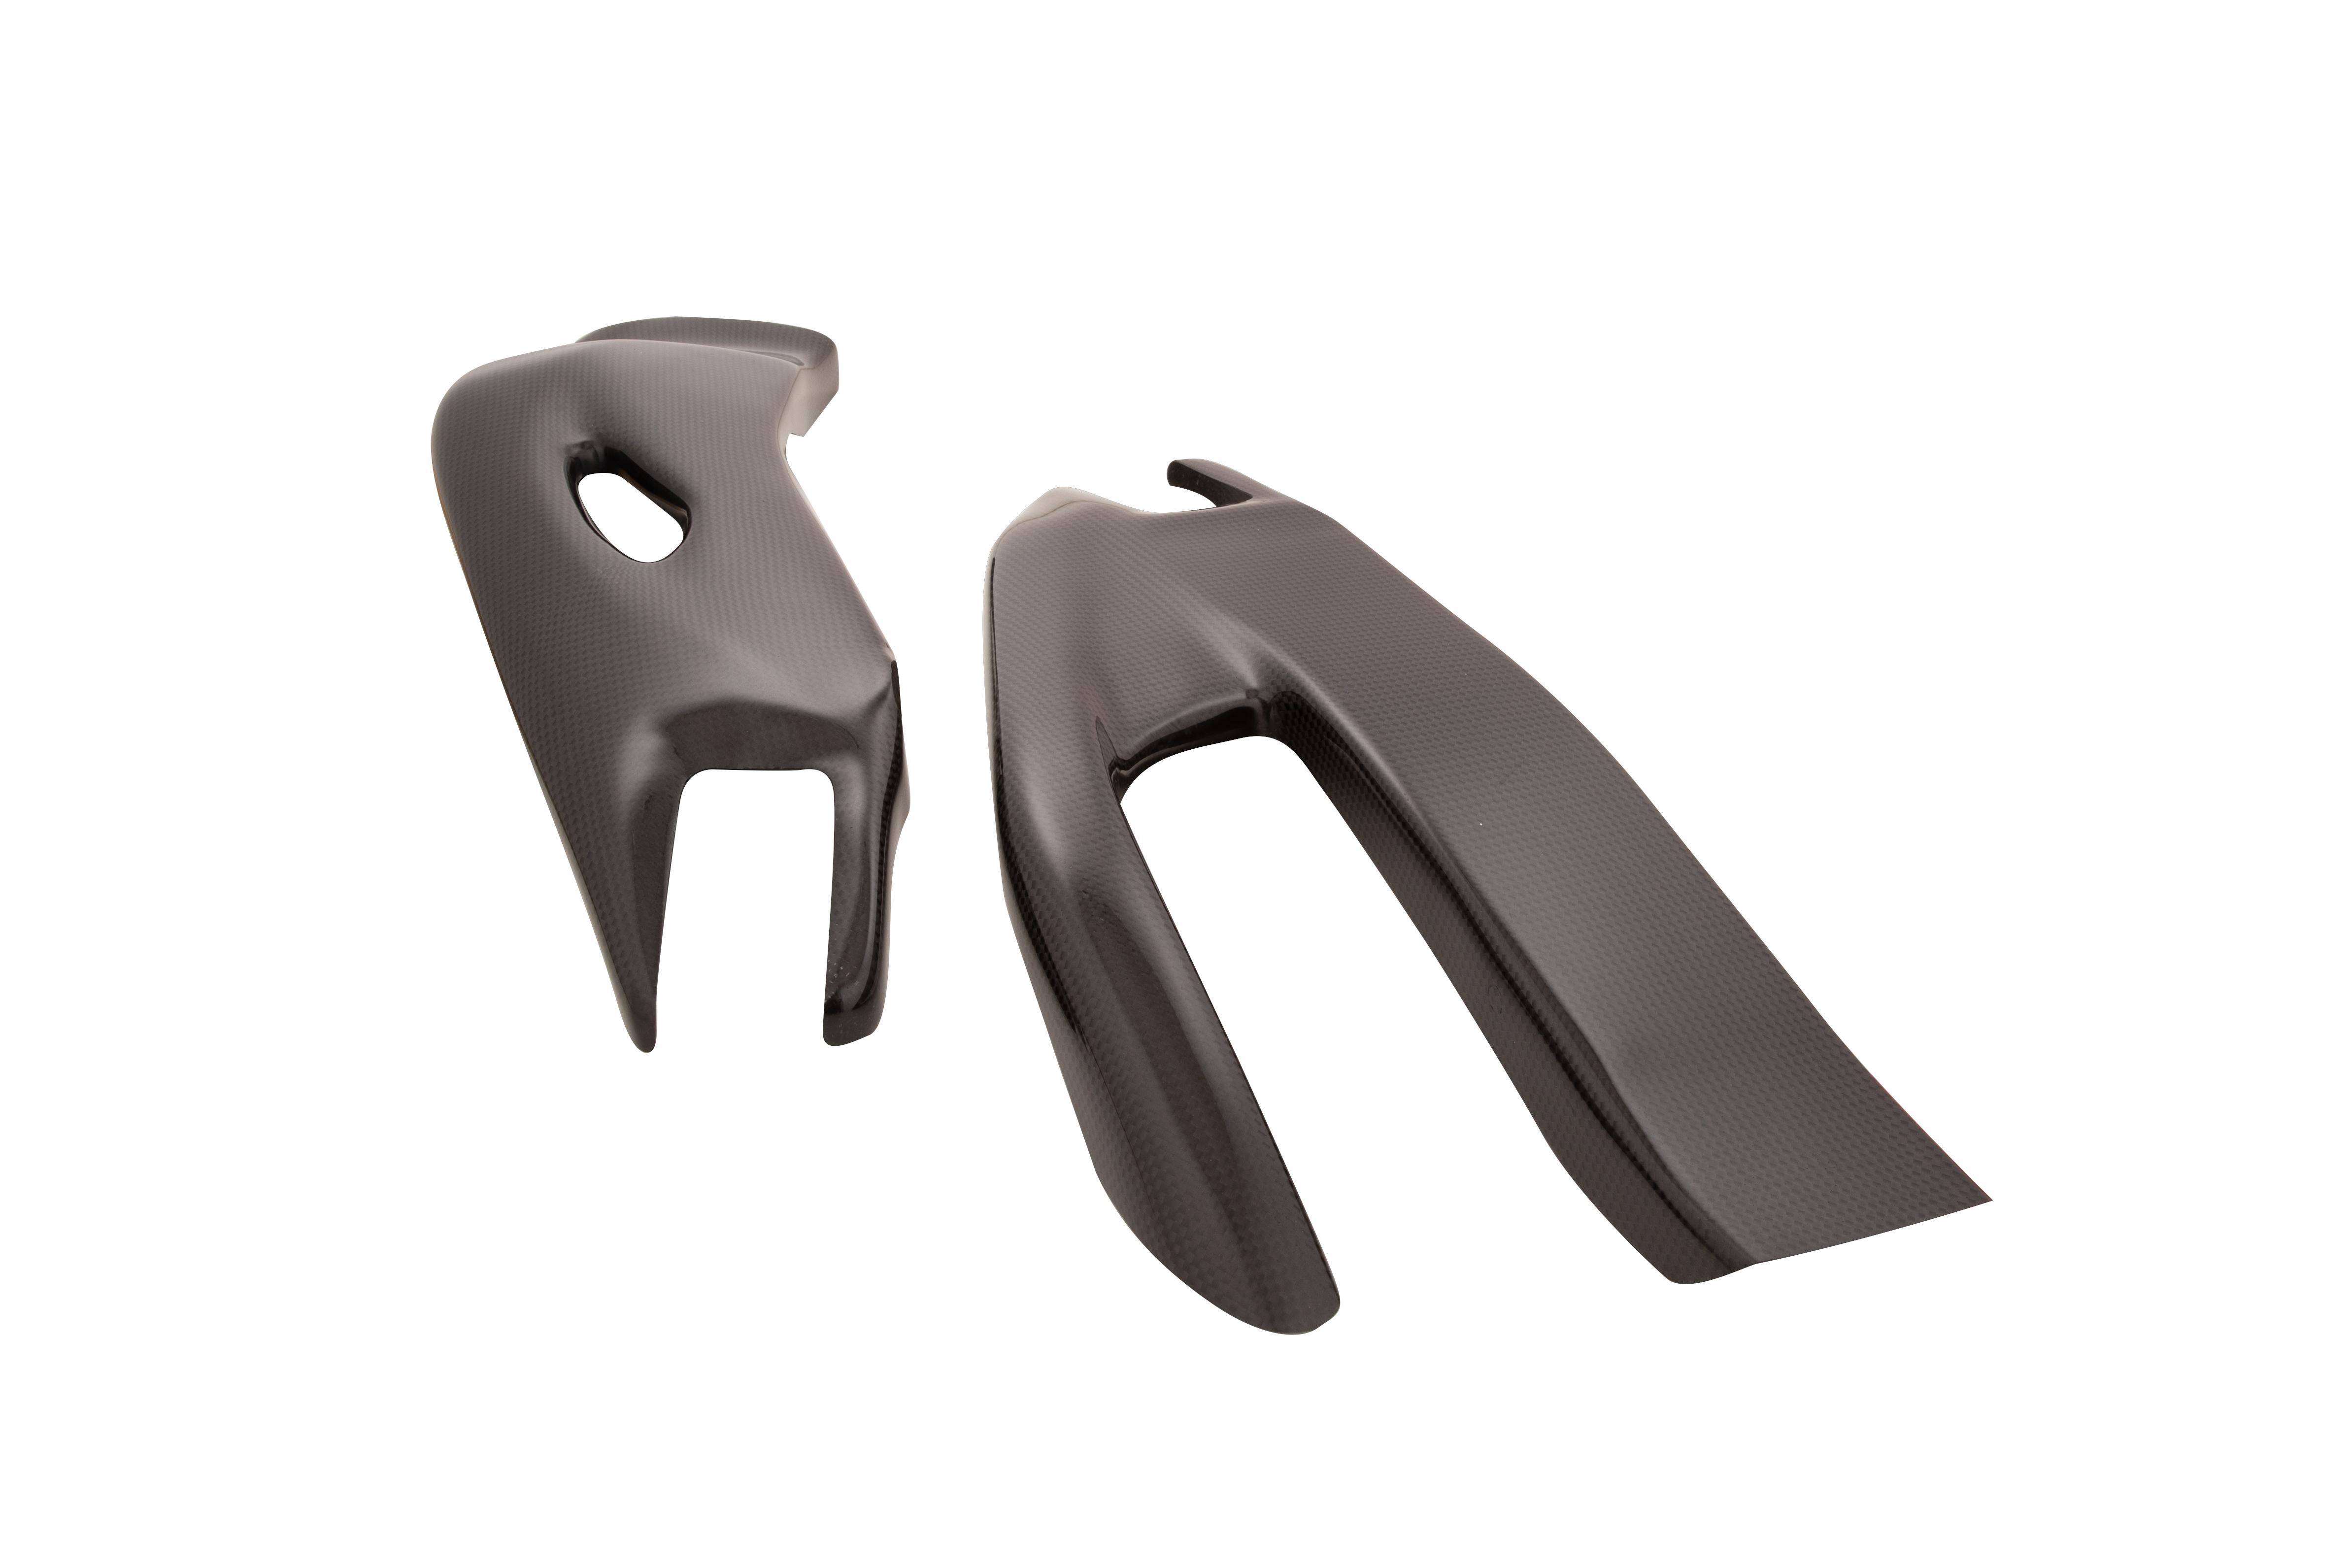 ARM PROTECTIONS HONDA CBR 1000R (17-19)